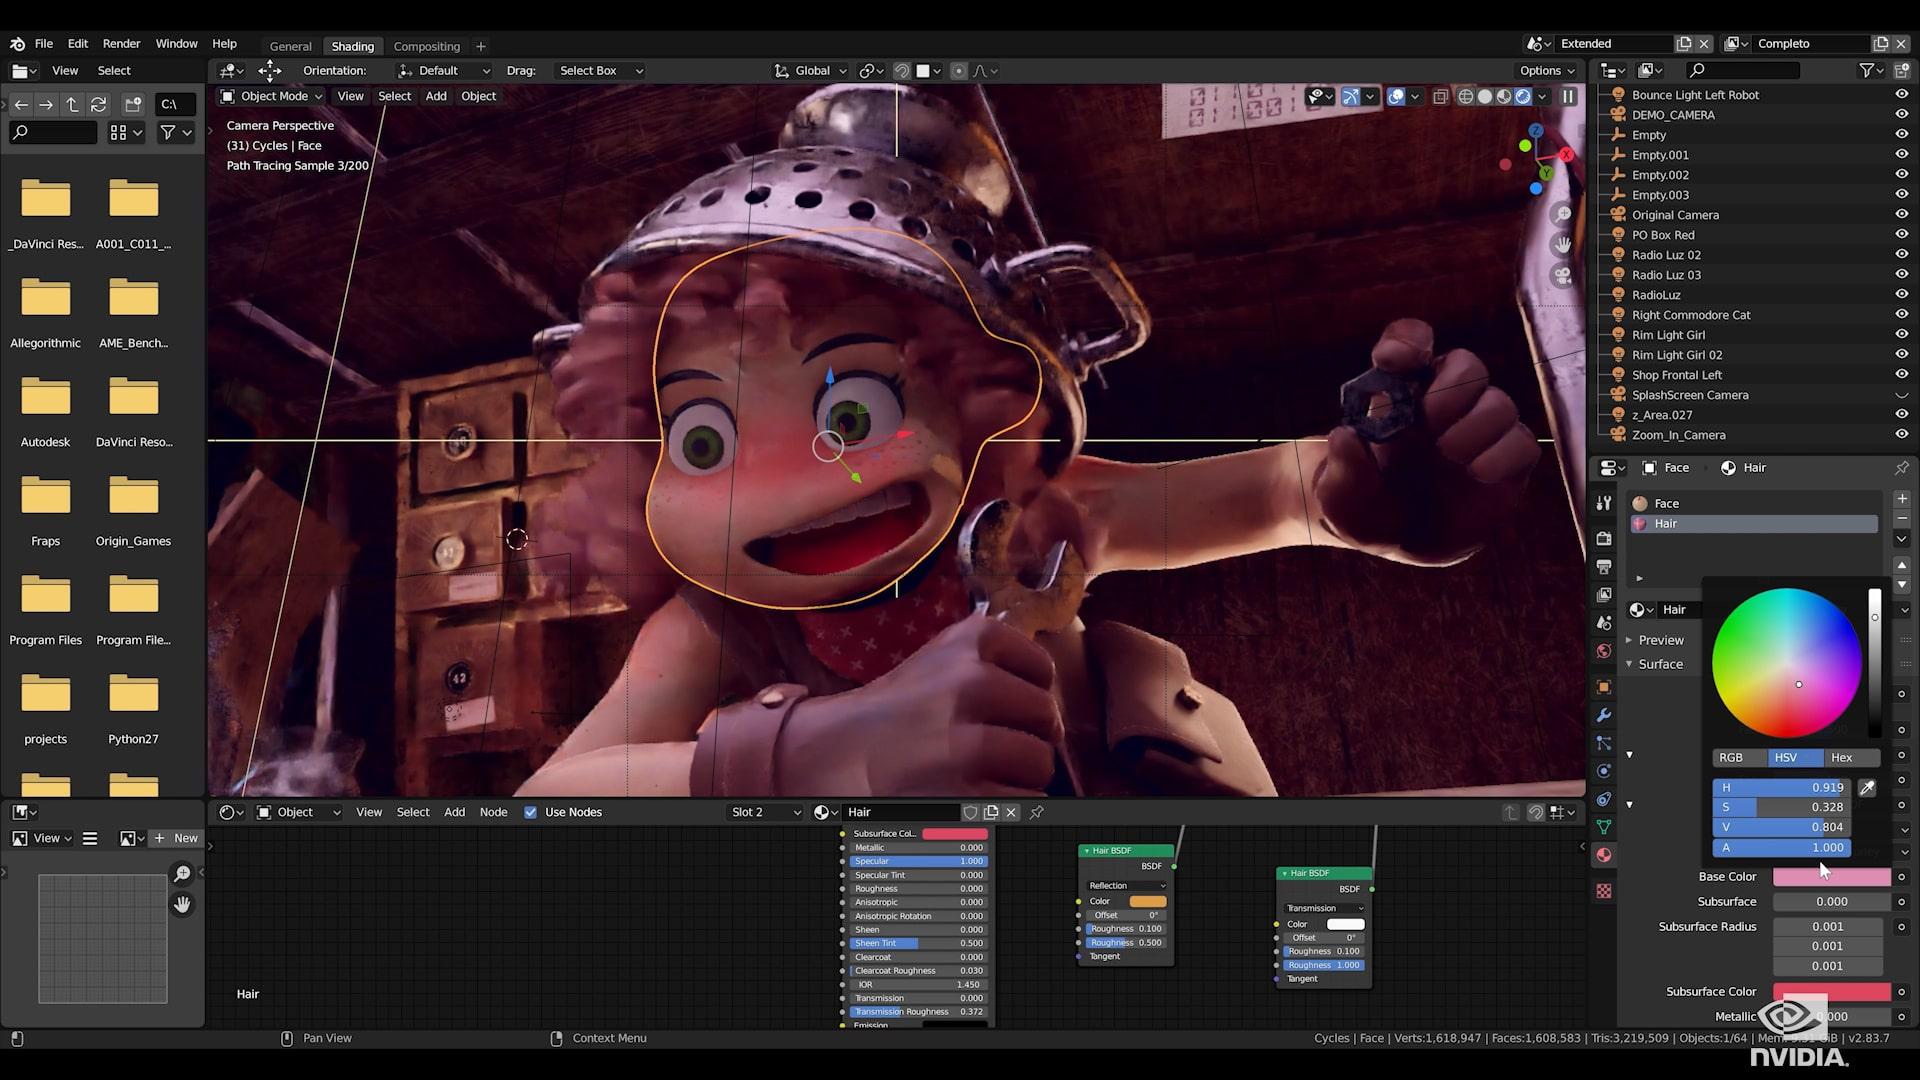 Скриншот из Blender. Источник: Nvidia